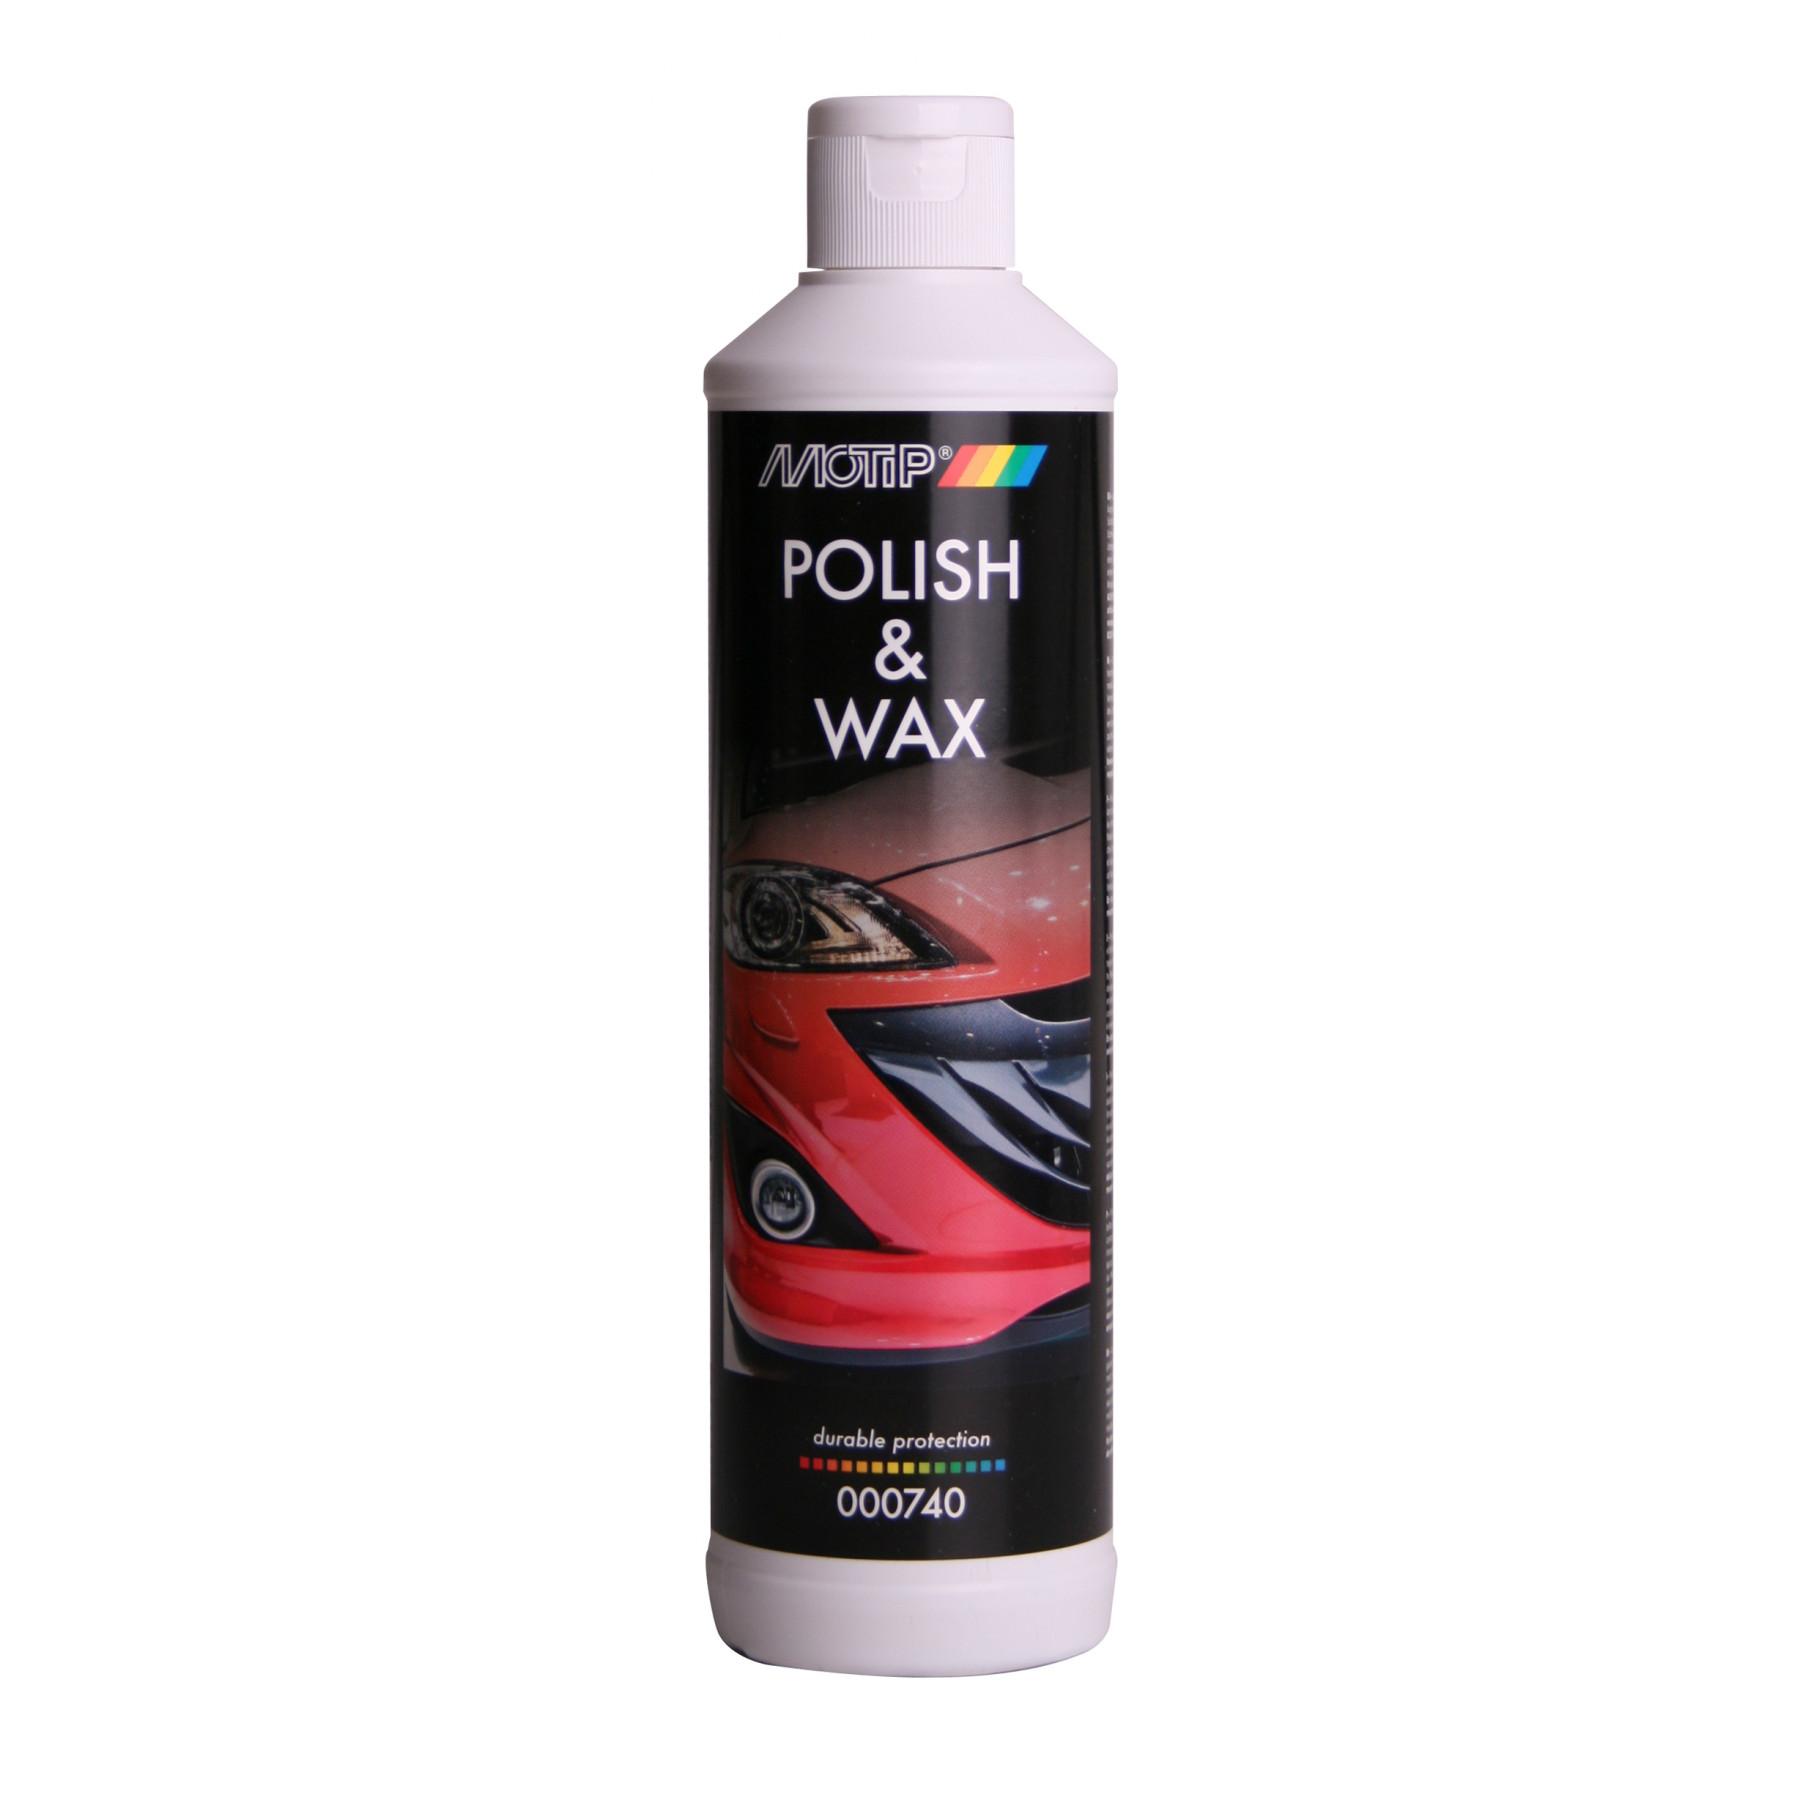 000740 Car polish + wax 500 ml.